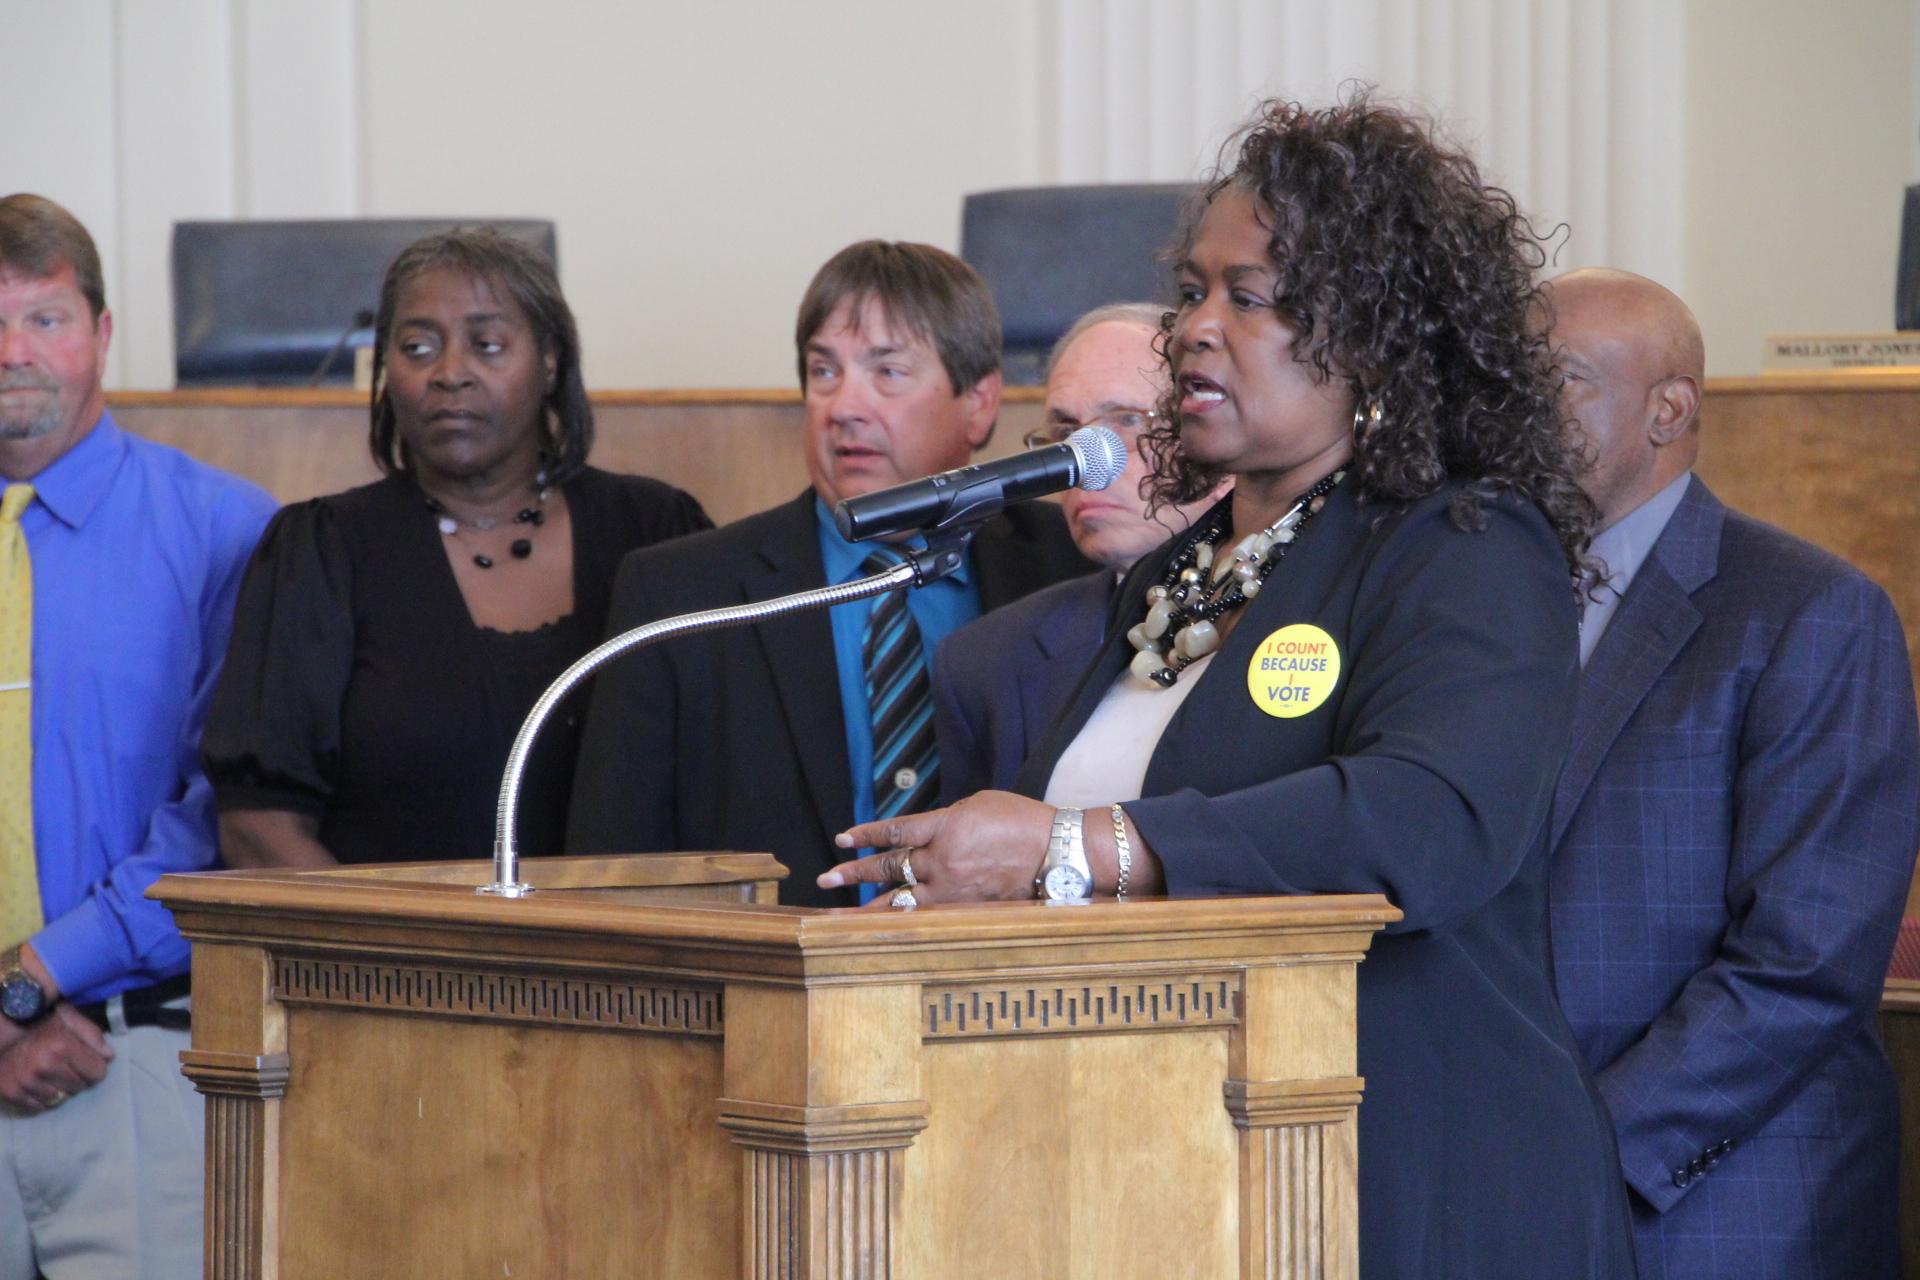 Dr. Martin Luther King, Jr. Commission, partners hosting Public Works appreciation breakfast